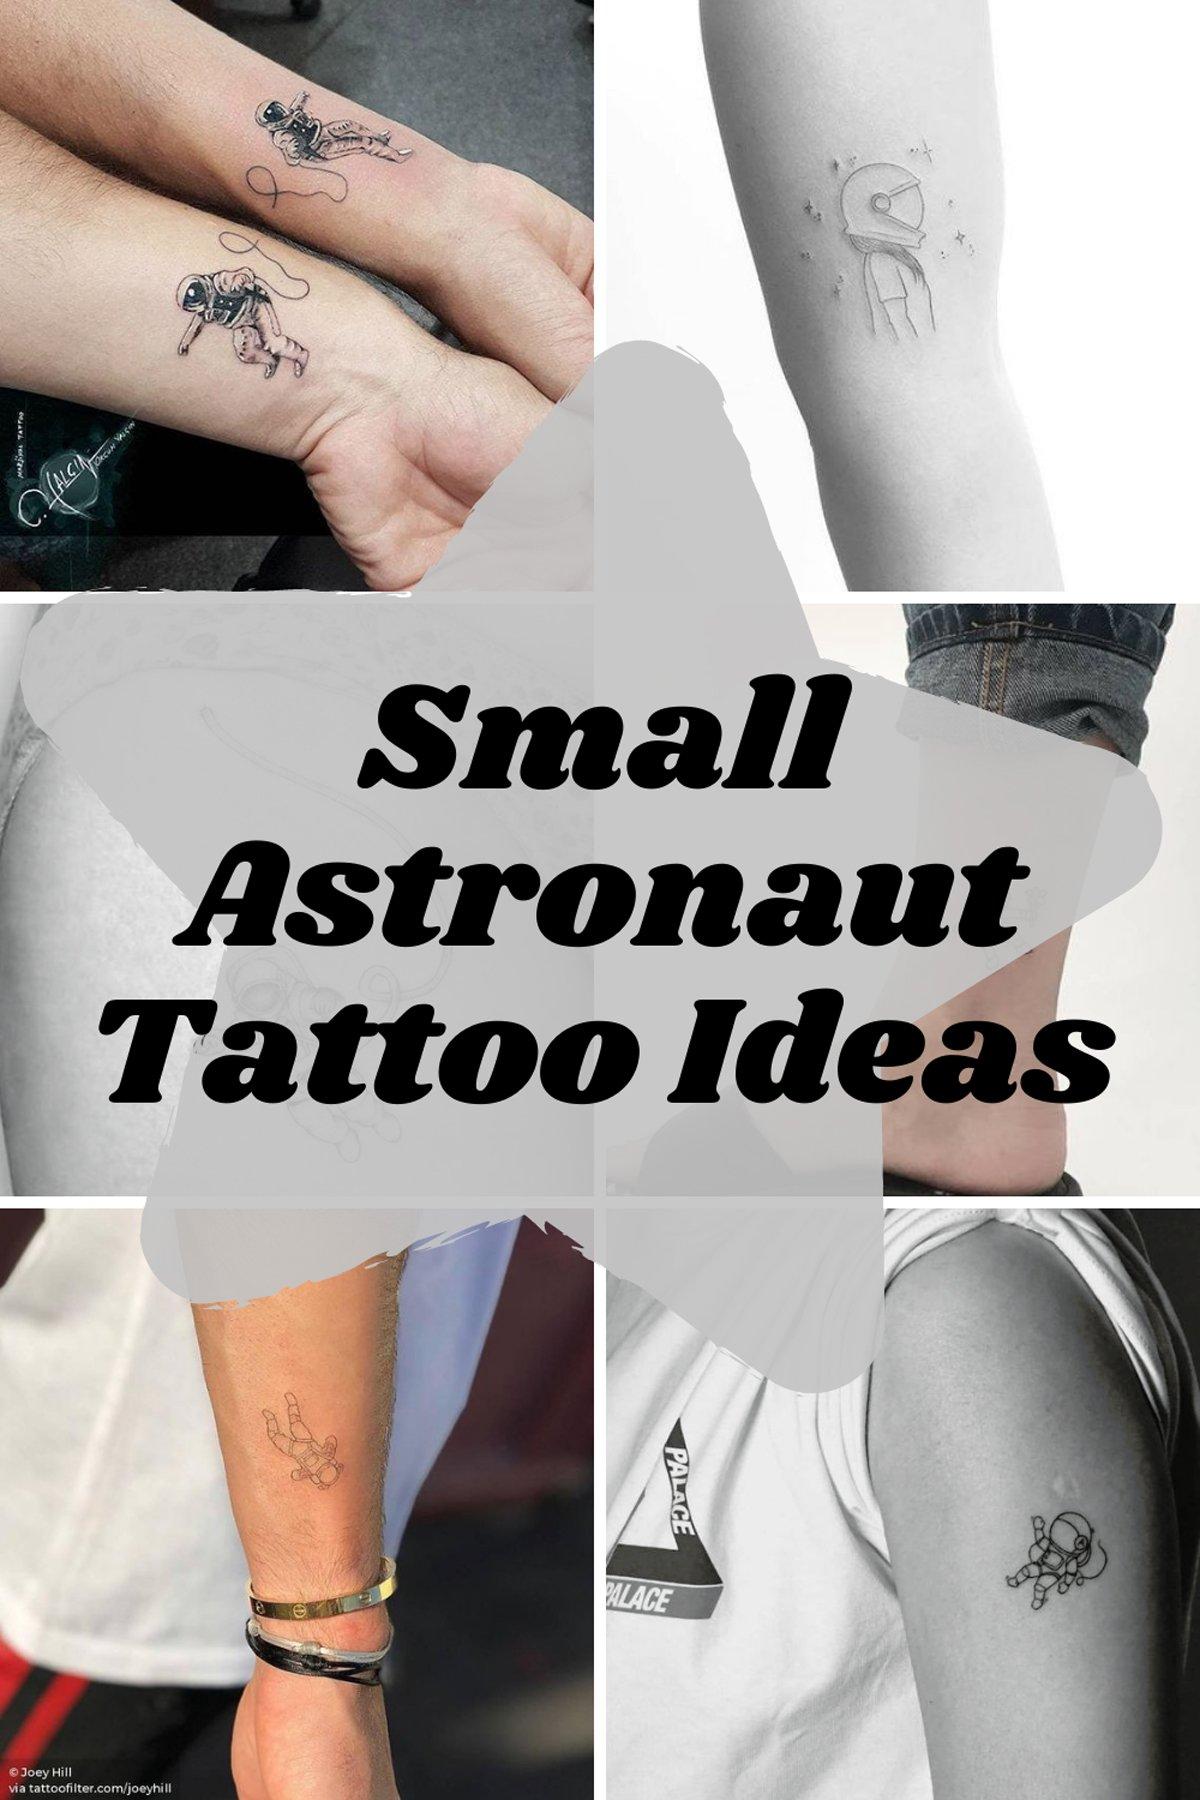 Small Astronaut Tattoo Ideas